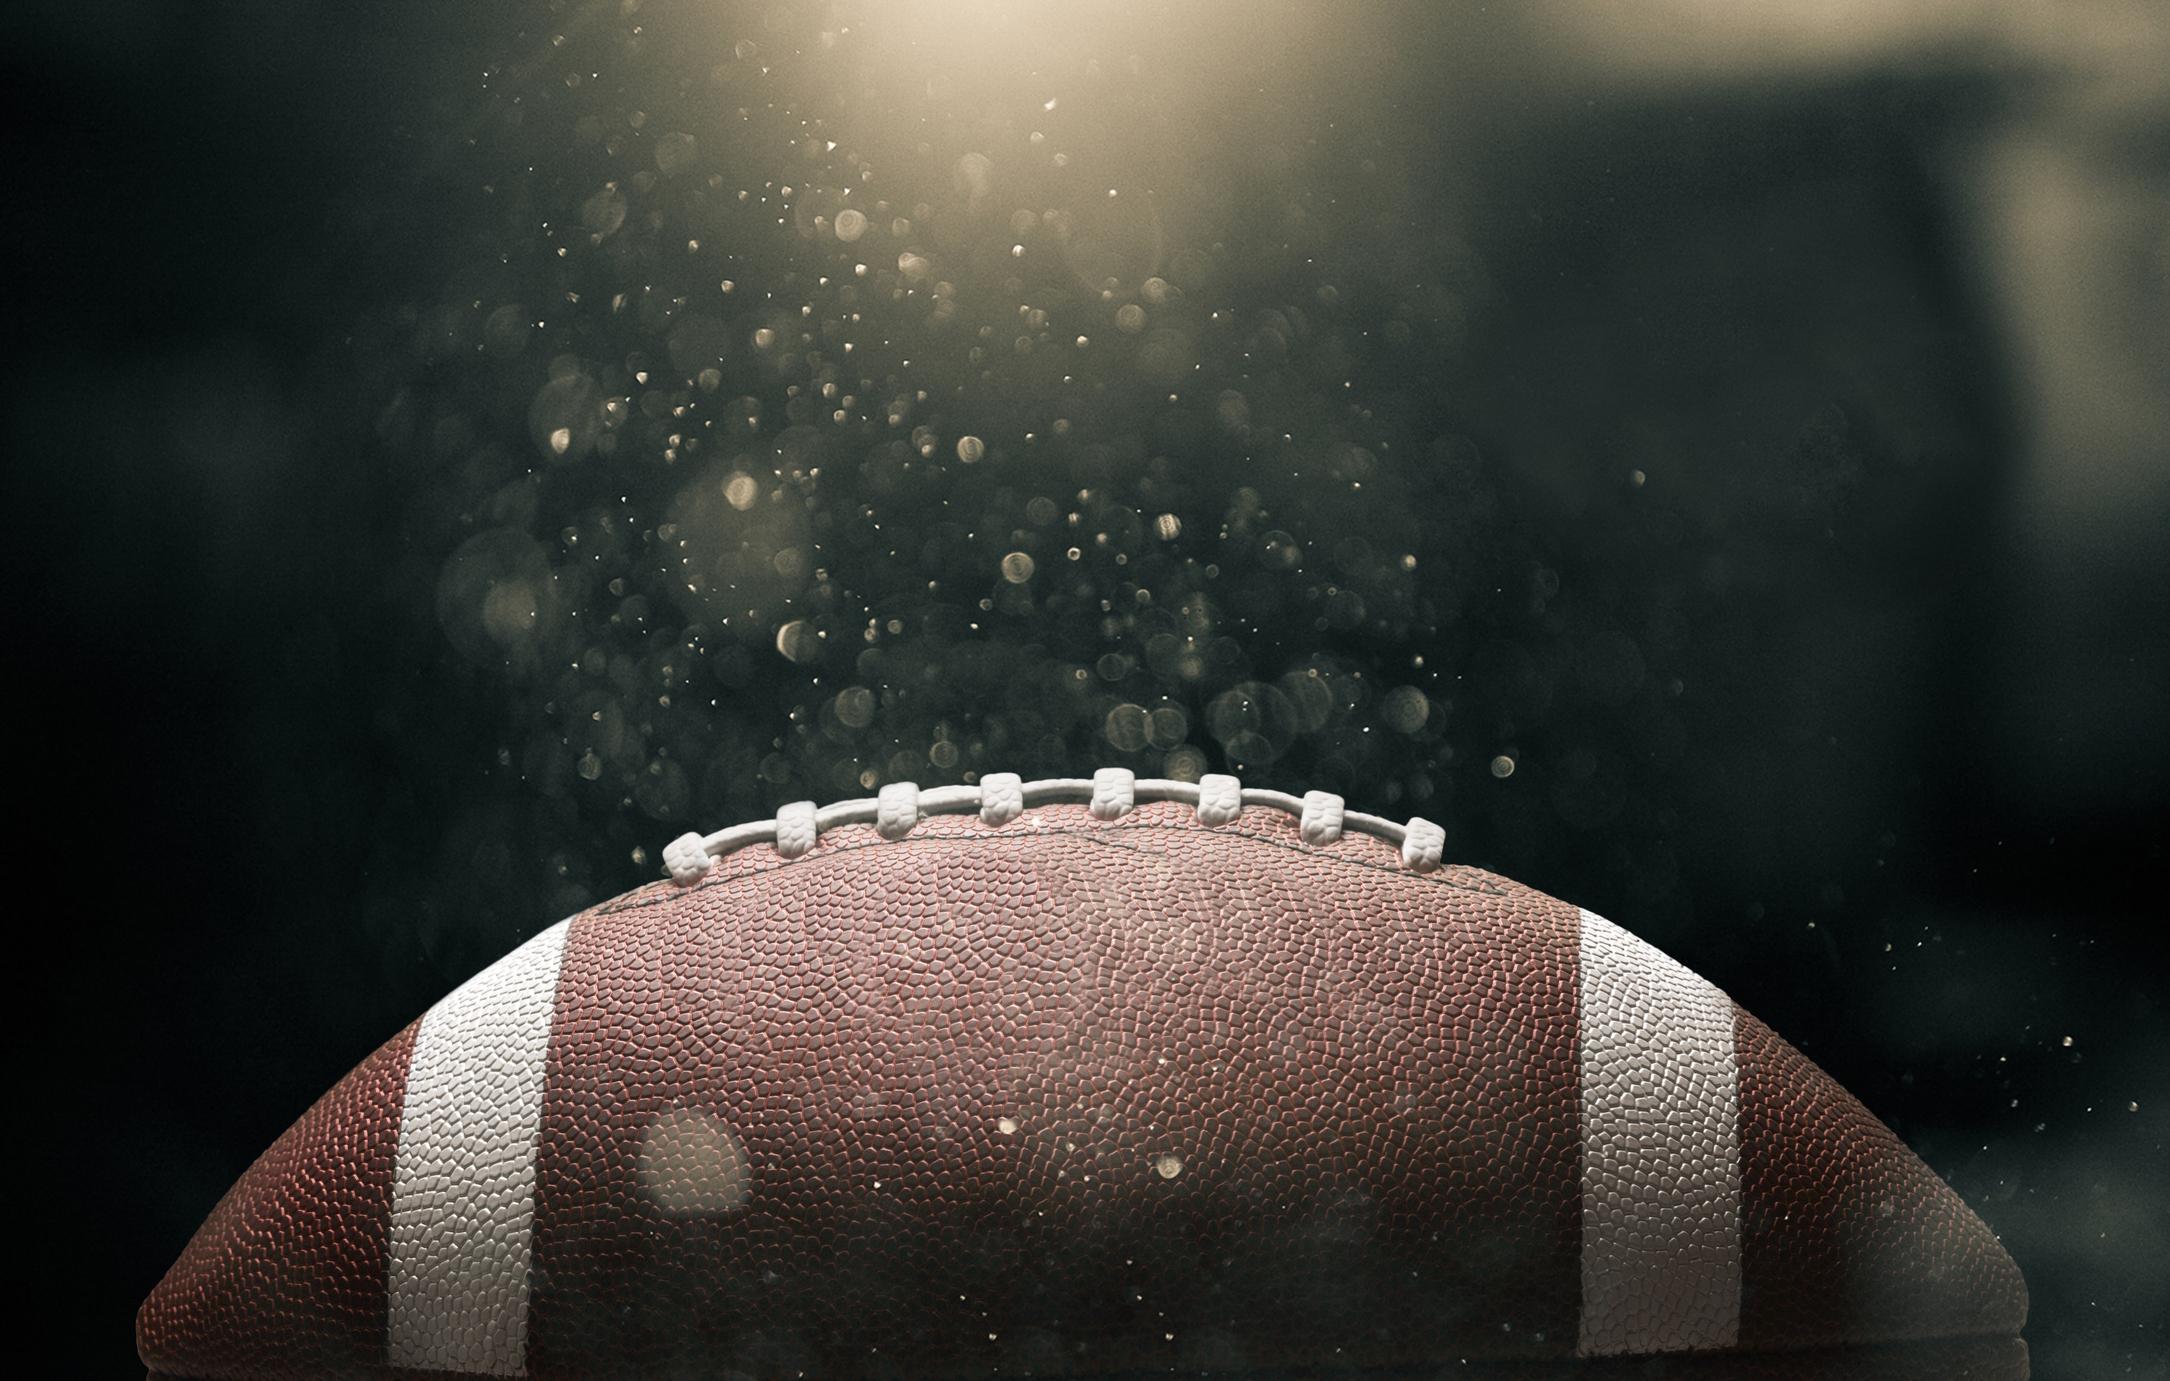 Football (Stock image/Getty)